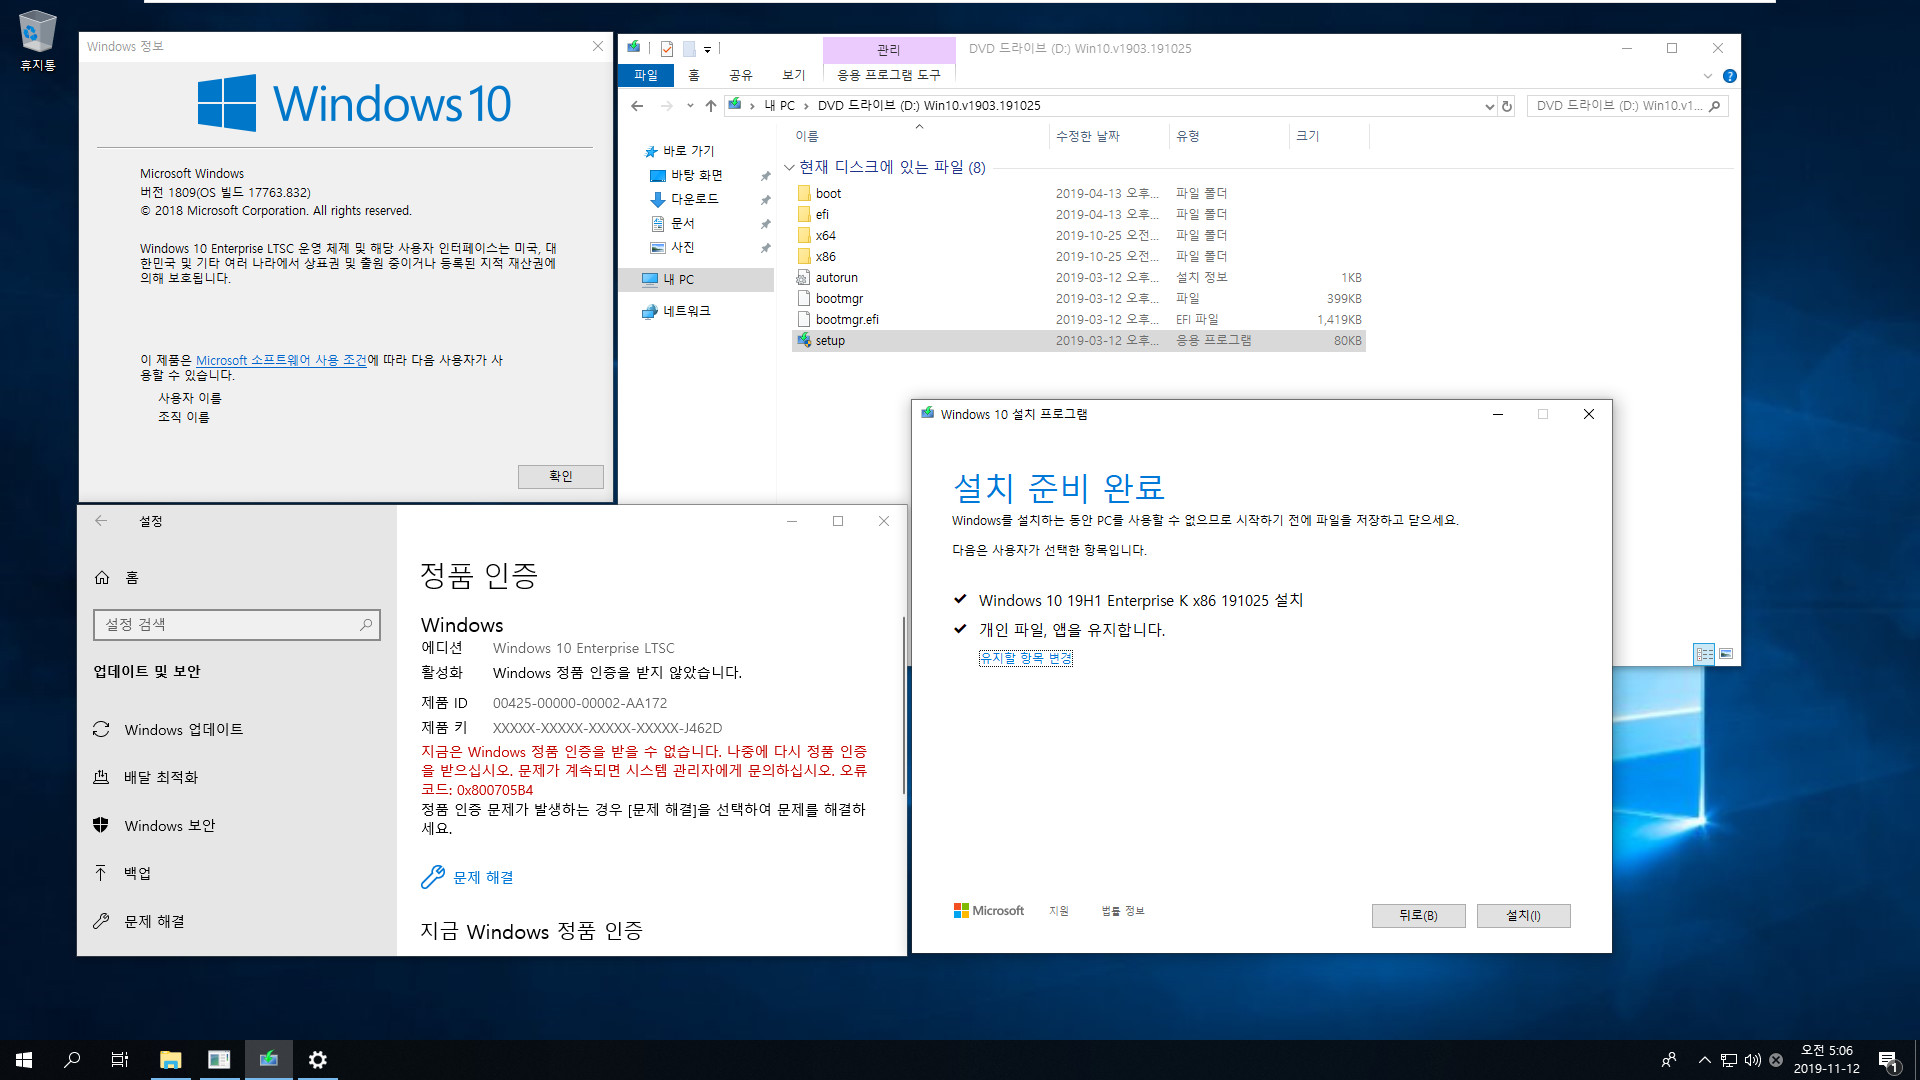 Windows 10 Enterprise LTSC [2019] (버전 1809) 를 버전 1903 프로로 업그레이드 설치하기 - 우선 설정과 앱 유지를 위해서 버전 1903 Enterprise로 업그레이드 한 후에 버전 1903 Pro로 변경하면 됩니다 2019-11-12_050620.jpg